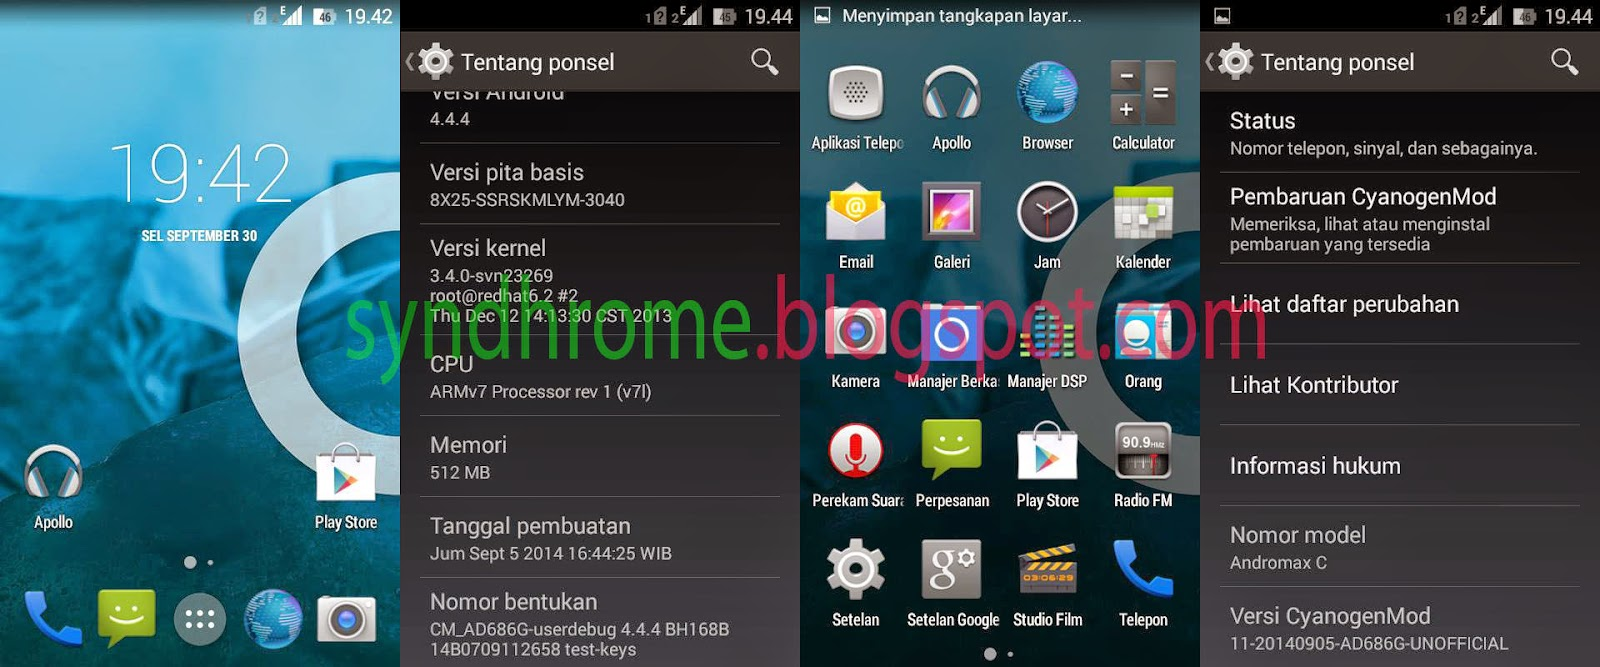 Install ROM Cyanogenmod 11 di Smartfren Andromax C Taerbaru | ROM Paling Fenomenal!